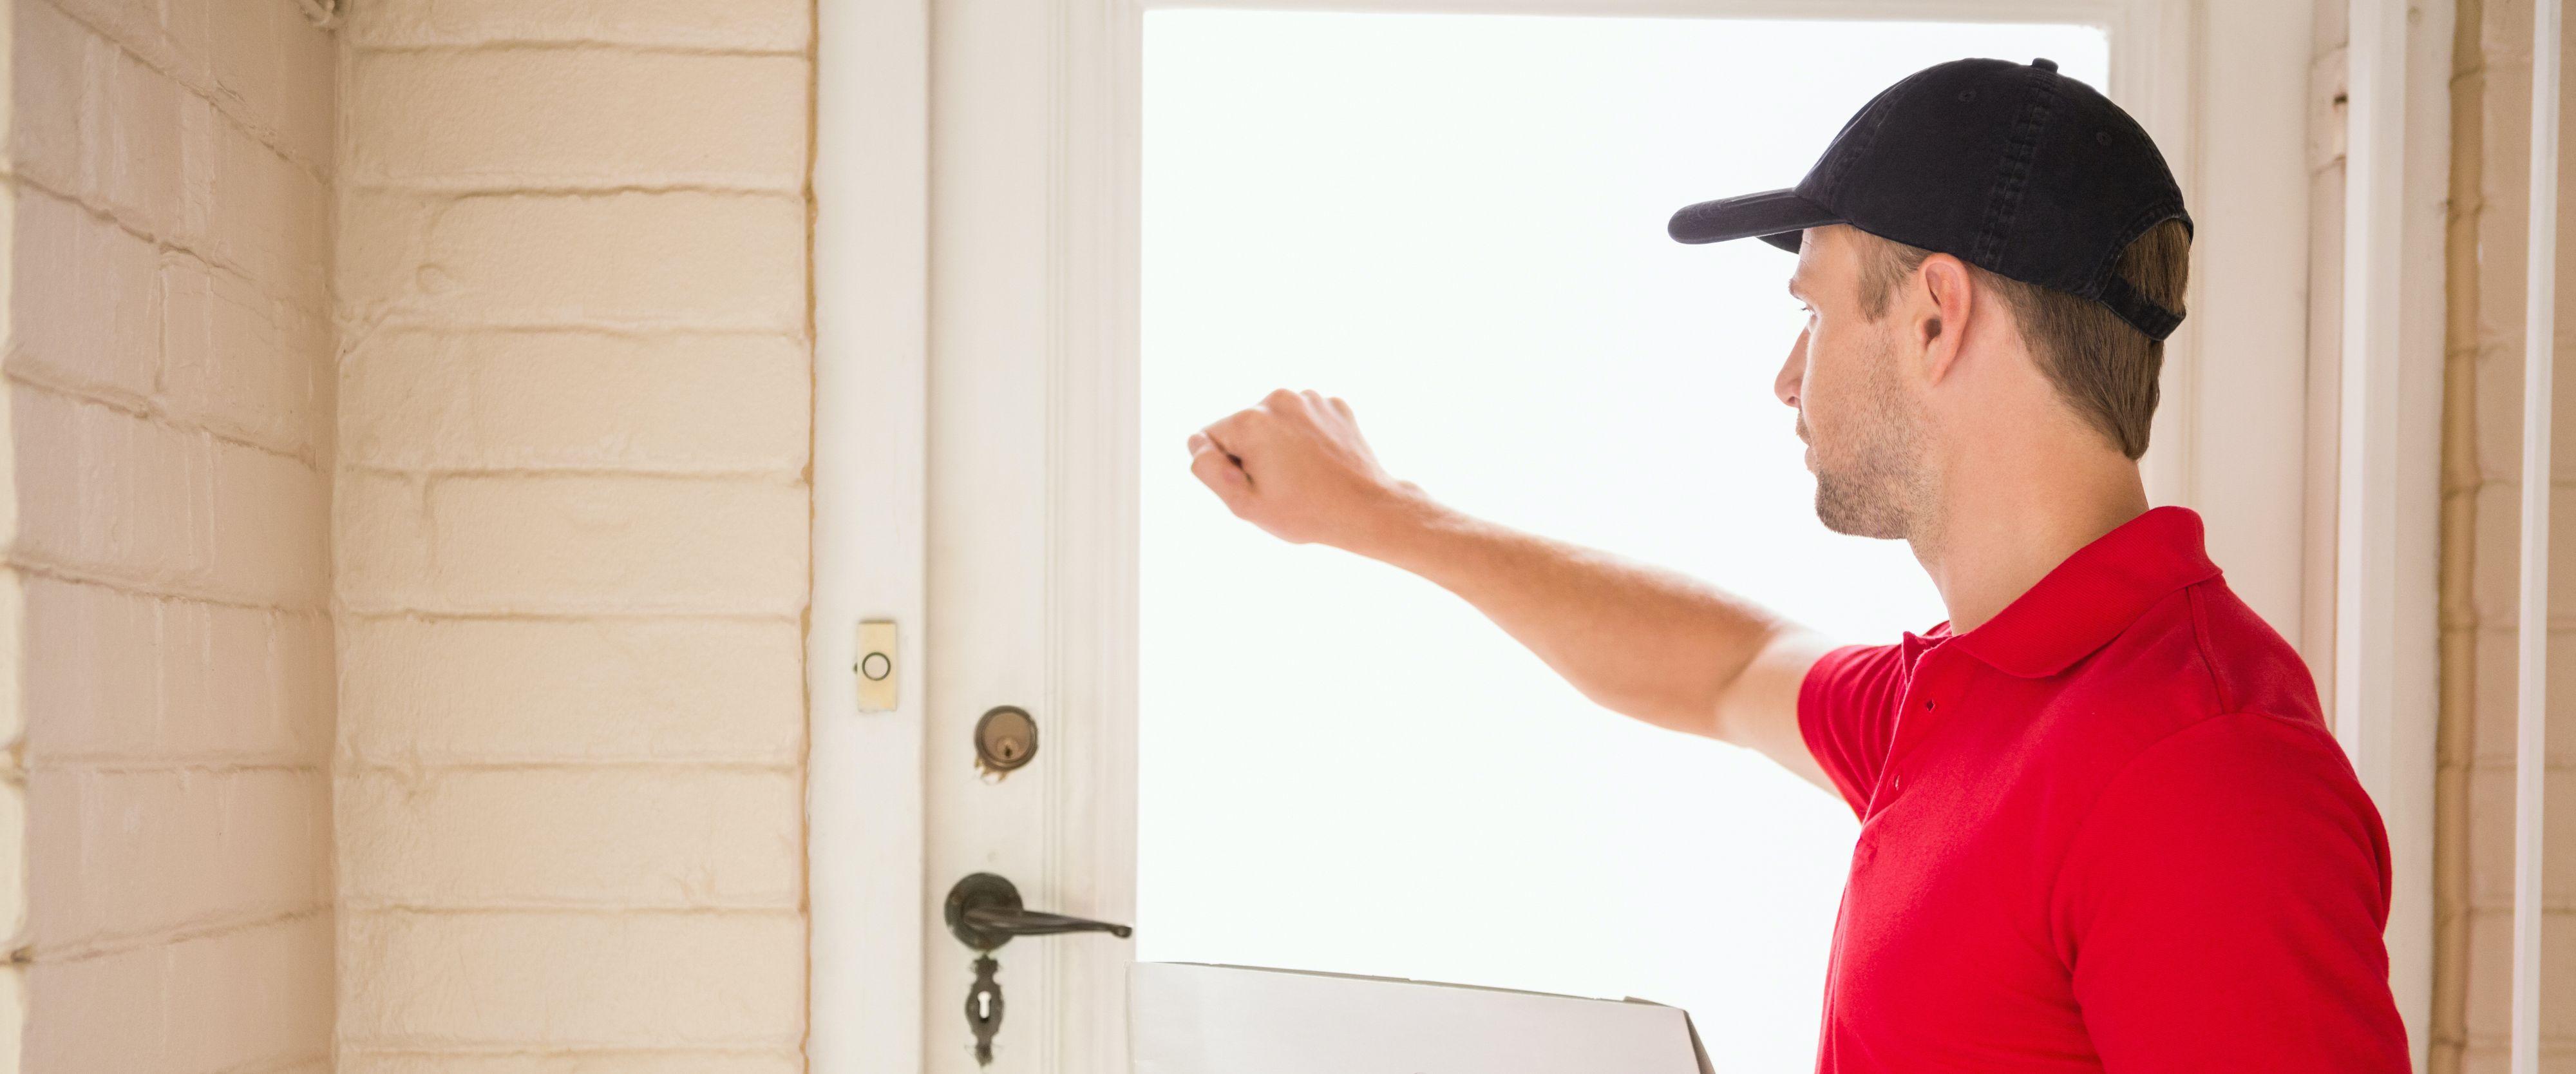 Delivery To Your Door!